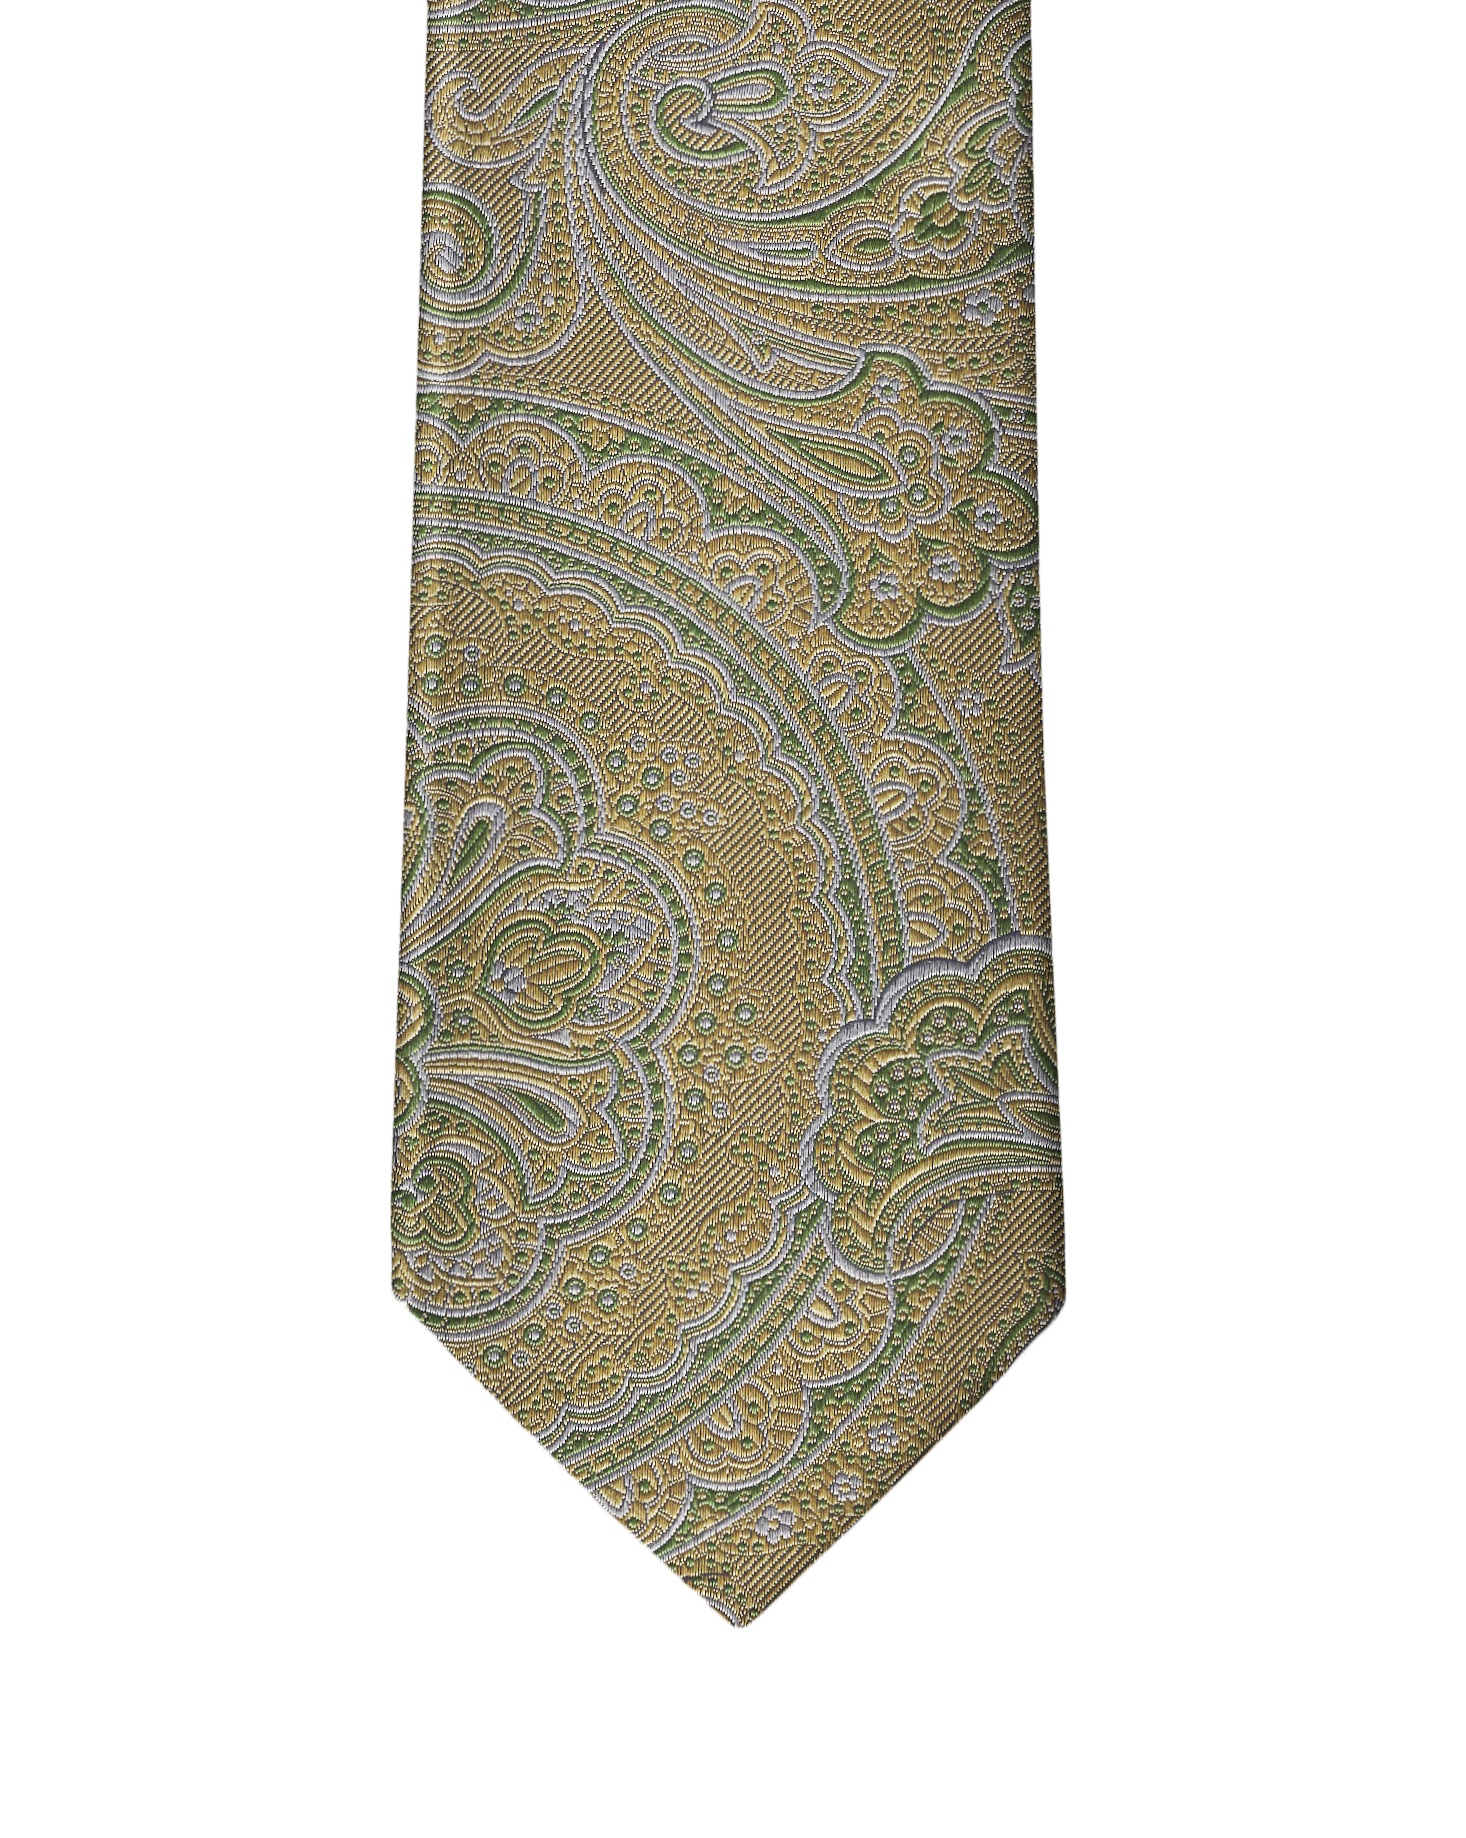 Pastel Yellow & Green Paisley Necktie